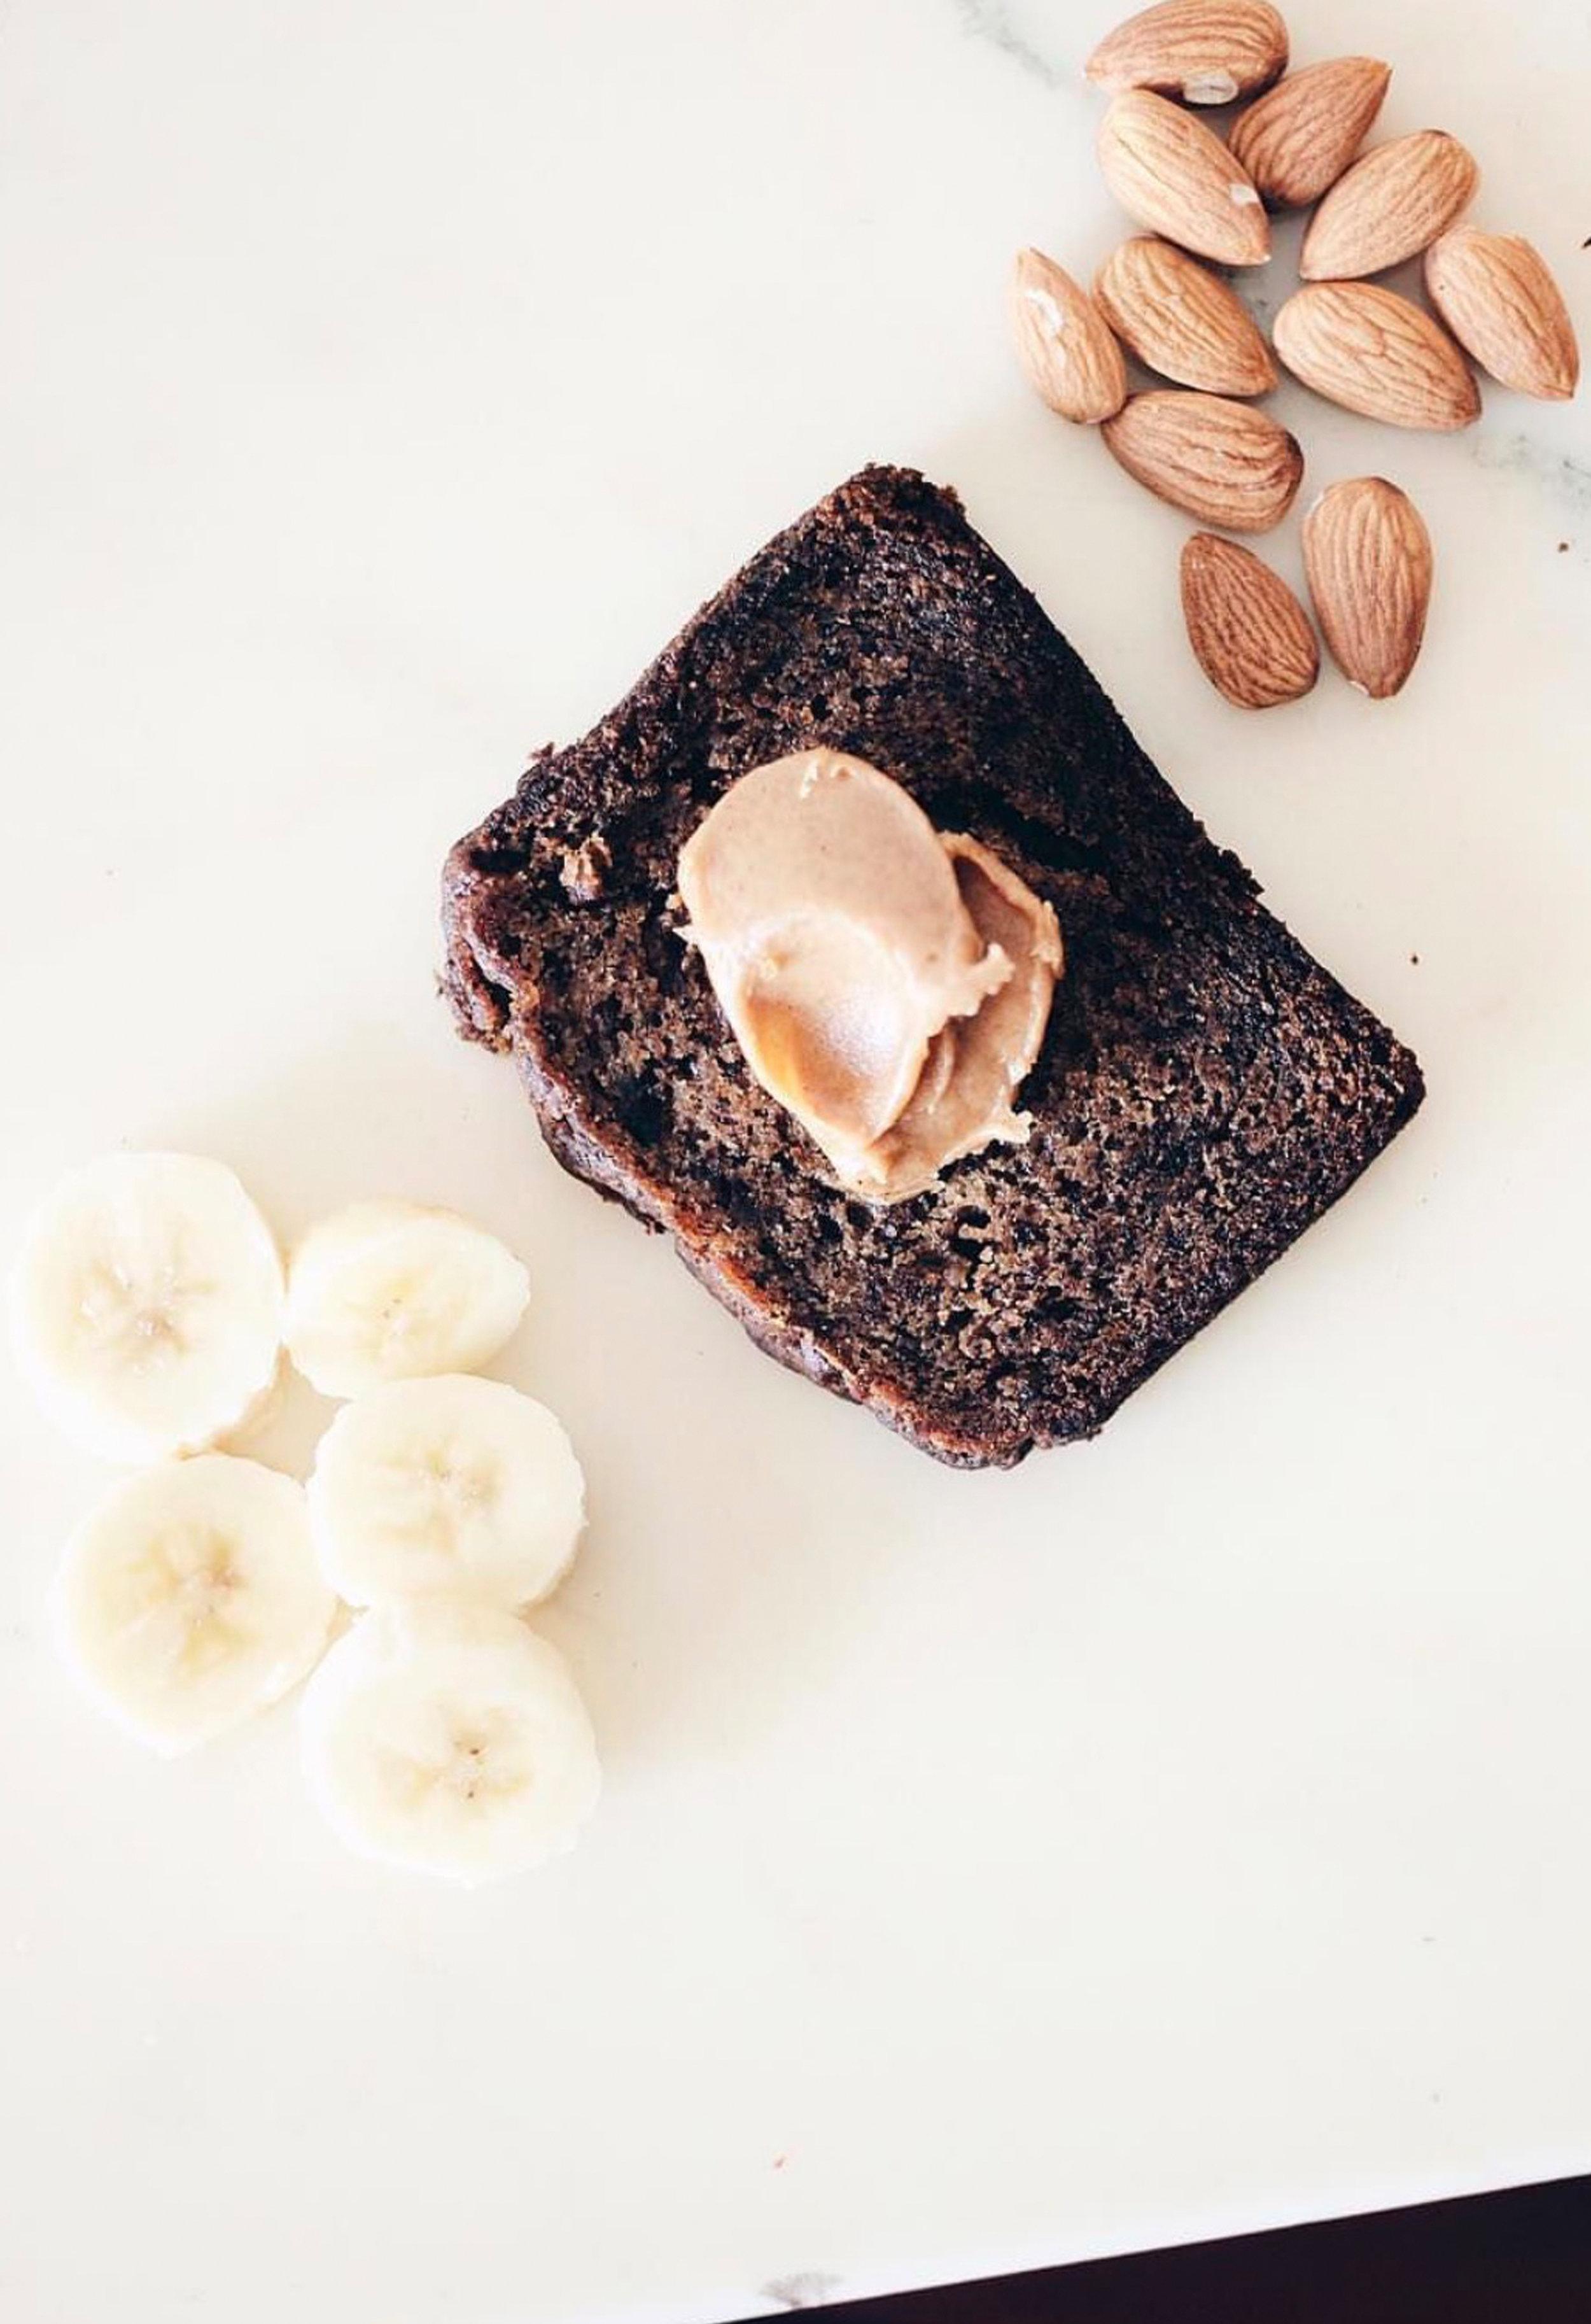 Banana Bread with Peanut Butter Spread.jpg